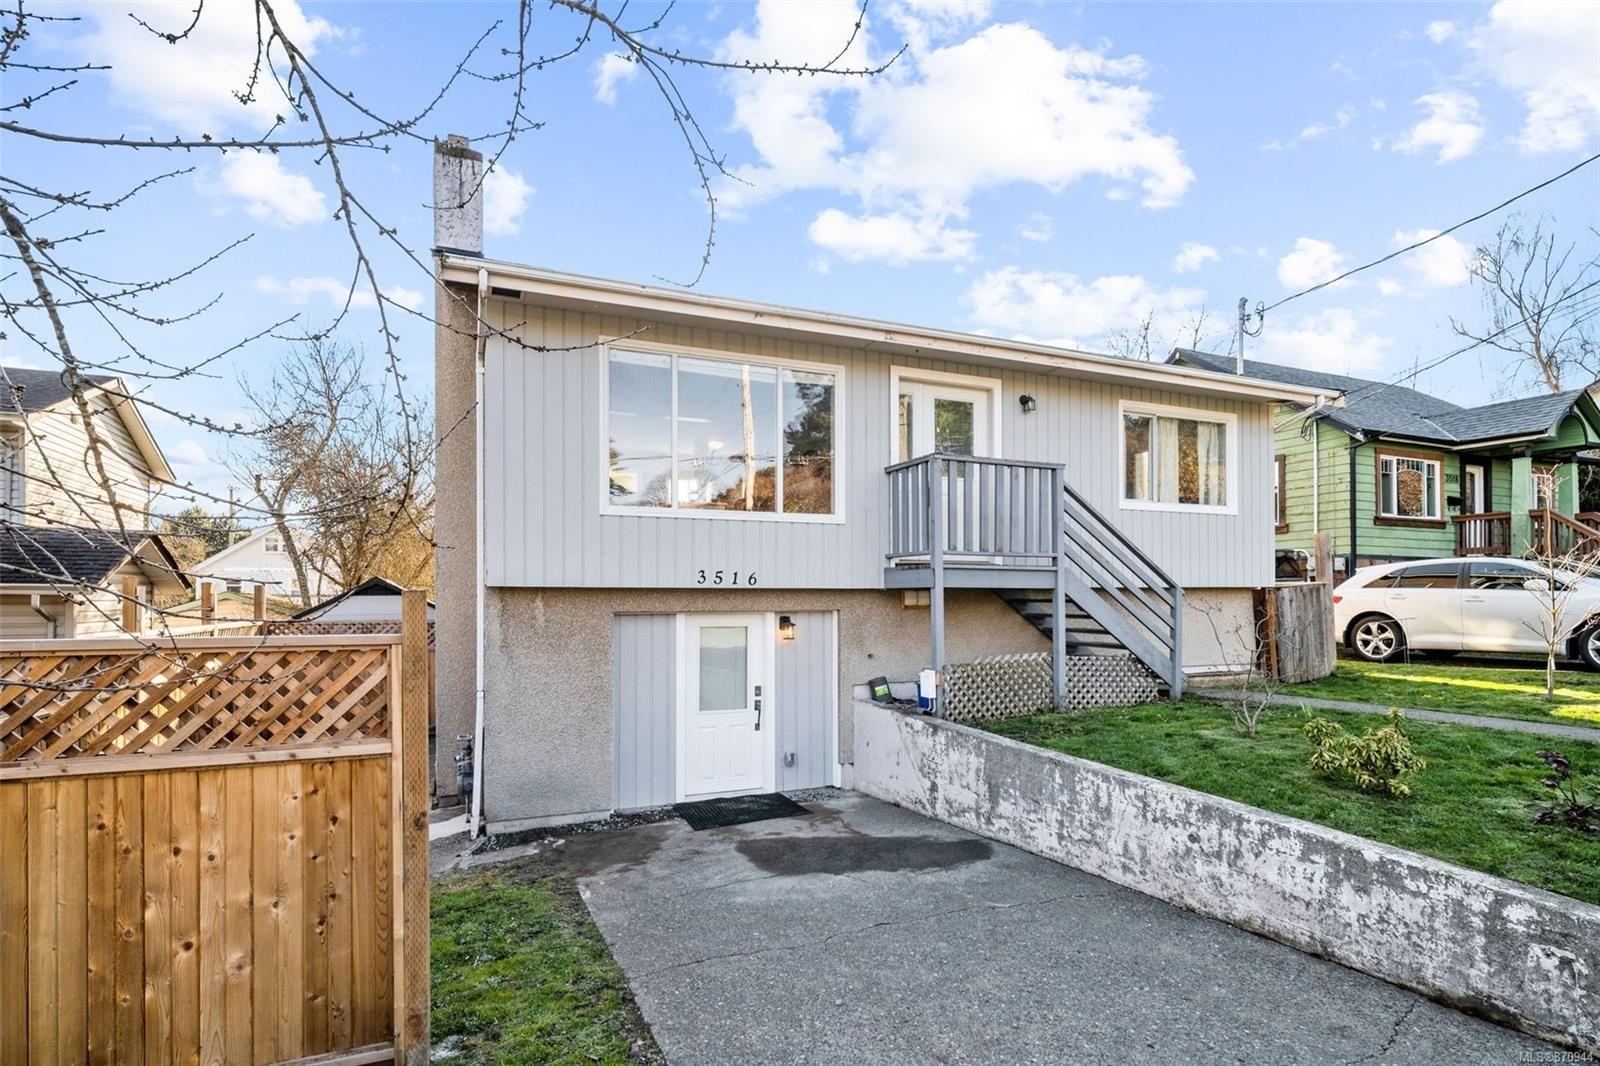 Main Photo: 3516 Calumet Ave in Saanich: SE Quadra House for sale (Saanich East)  : MLS®# 870944